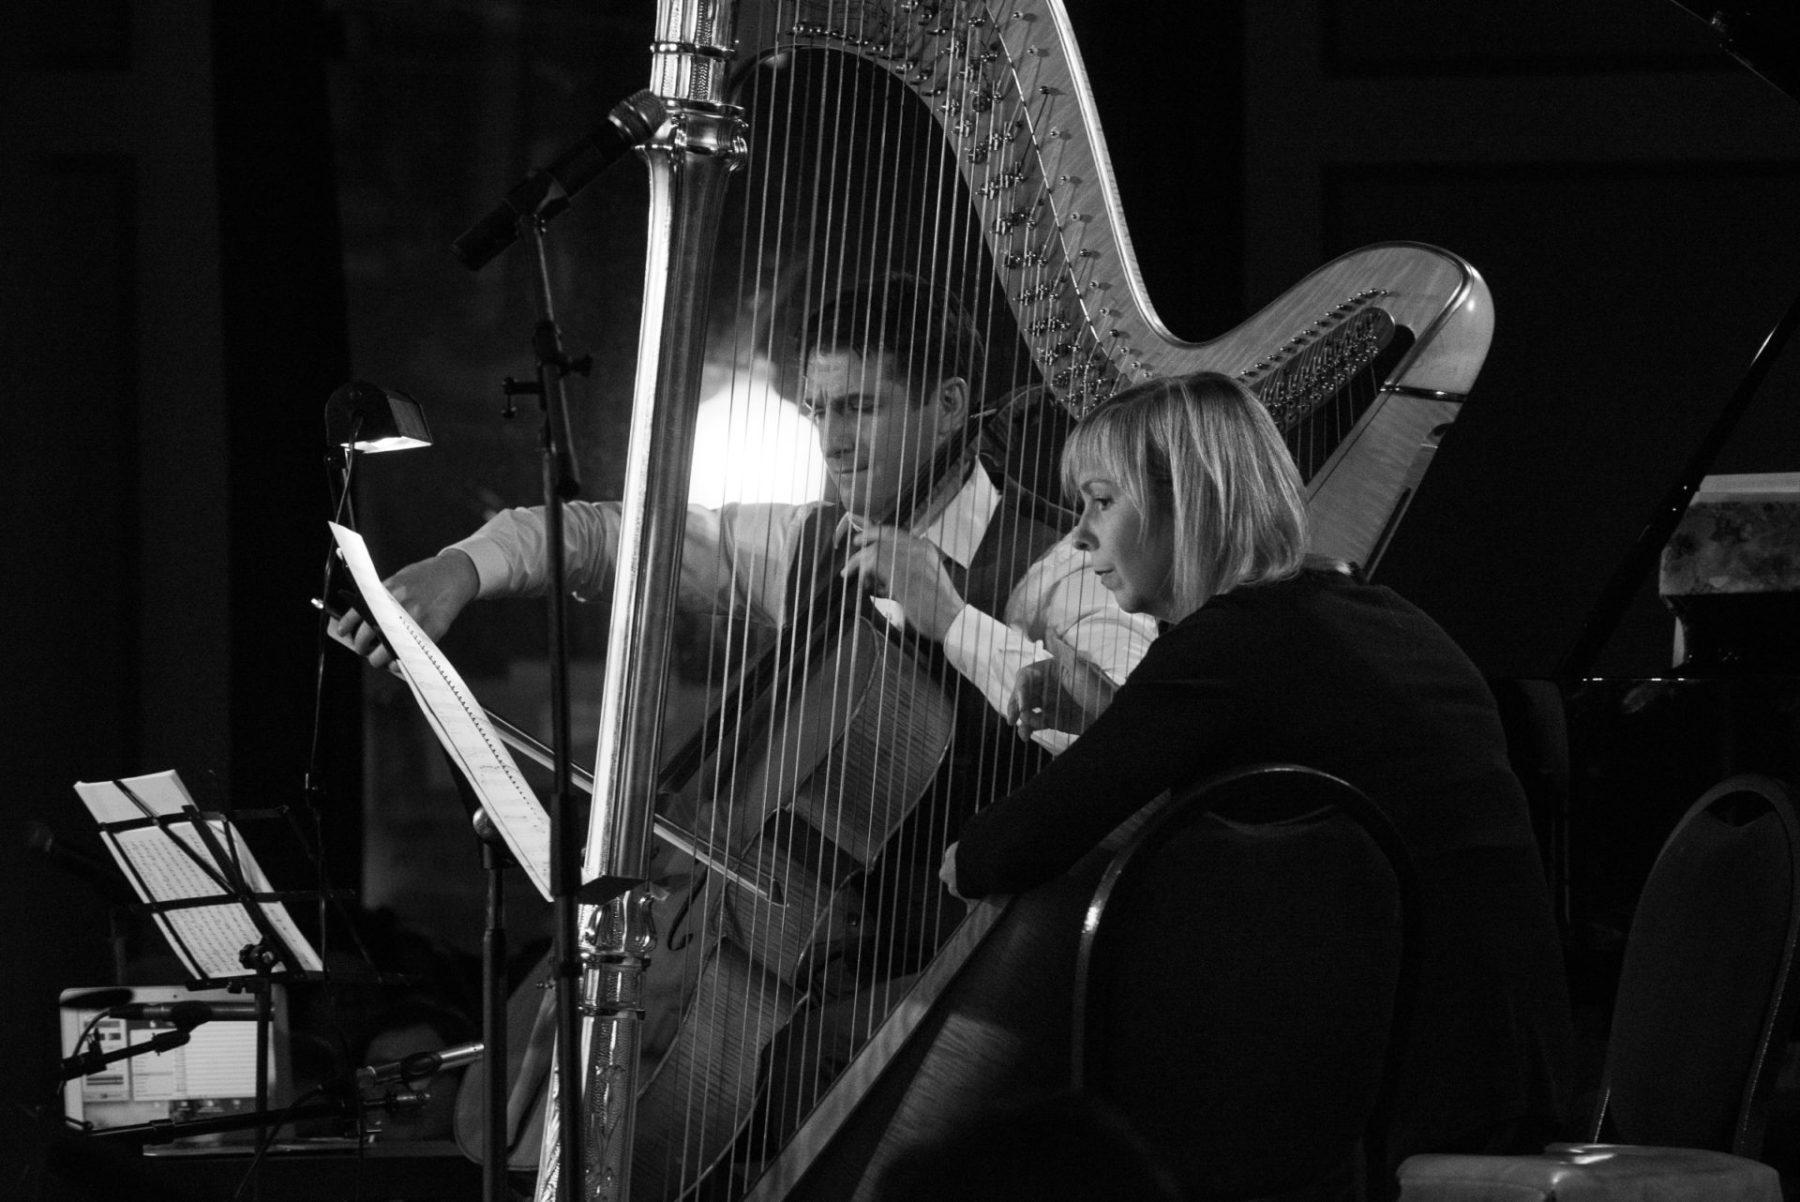 COULOIR, Ariel Barnes & Heidi Krutzen, Music for the Winter Solstice 2015